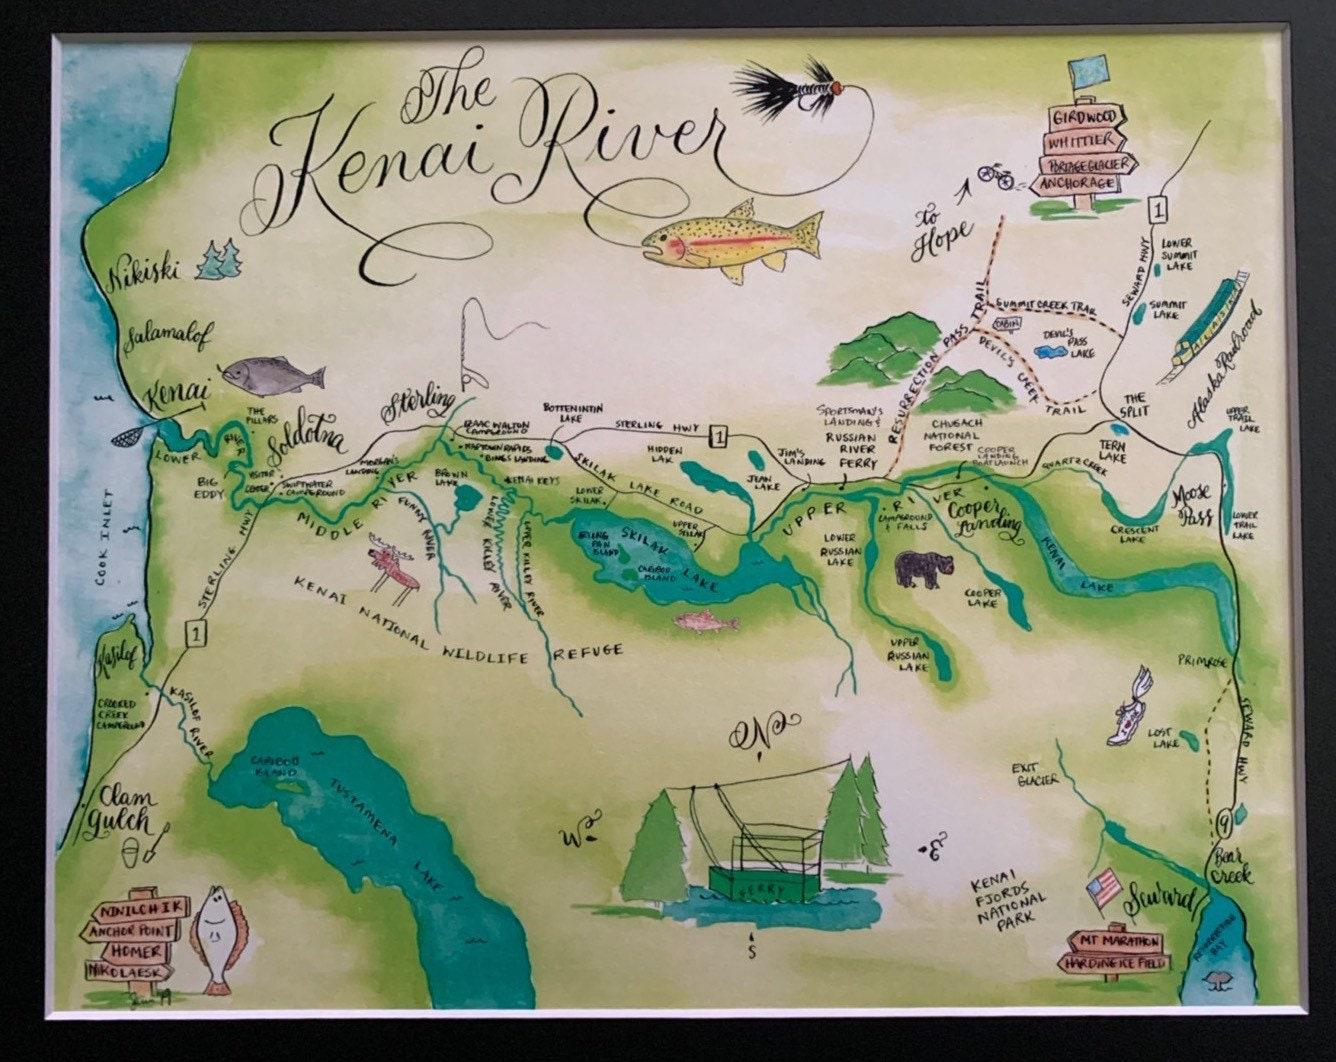 Kenai River Map on trail lakes alaska map, russian river falls trail map, swanson river alaska map, funny river alaska fire map, russian river alaska map, matanuska river alaska map, tustumena lake alaska map, kenai wilderness lodge alaska, alaska peninsula alaska map, mount redoubt alaska map, juneau alaska map, goodnews river alaska map, waterfall resort alaska map, soldotna alaska map, tazlina river alaska map, cooper lake alaska map, nome alaska map, mcneil river alaska map, situk river alaska map, long lake alaska map,